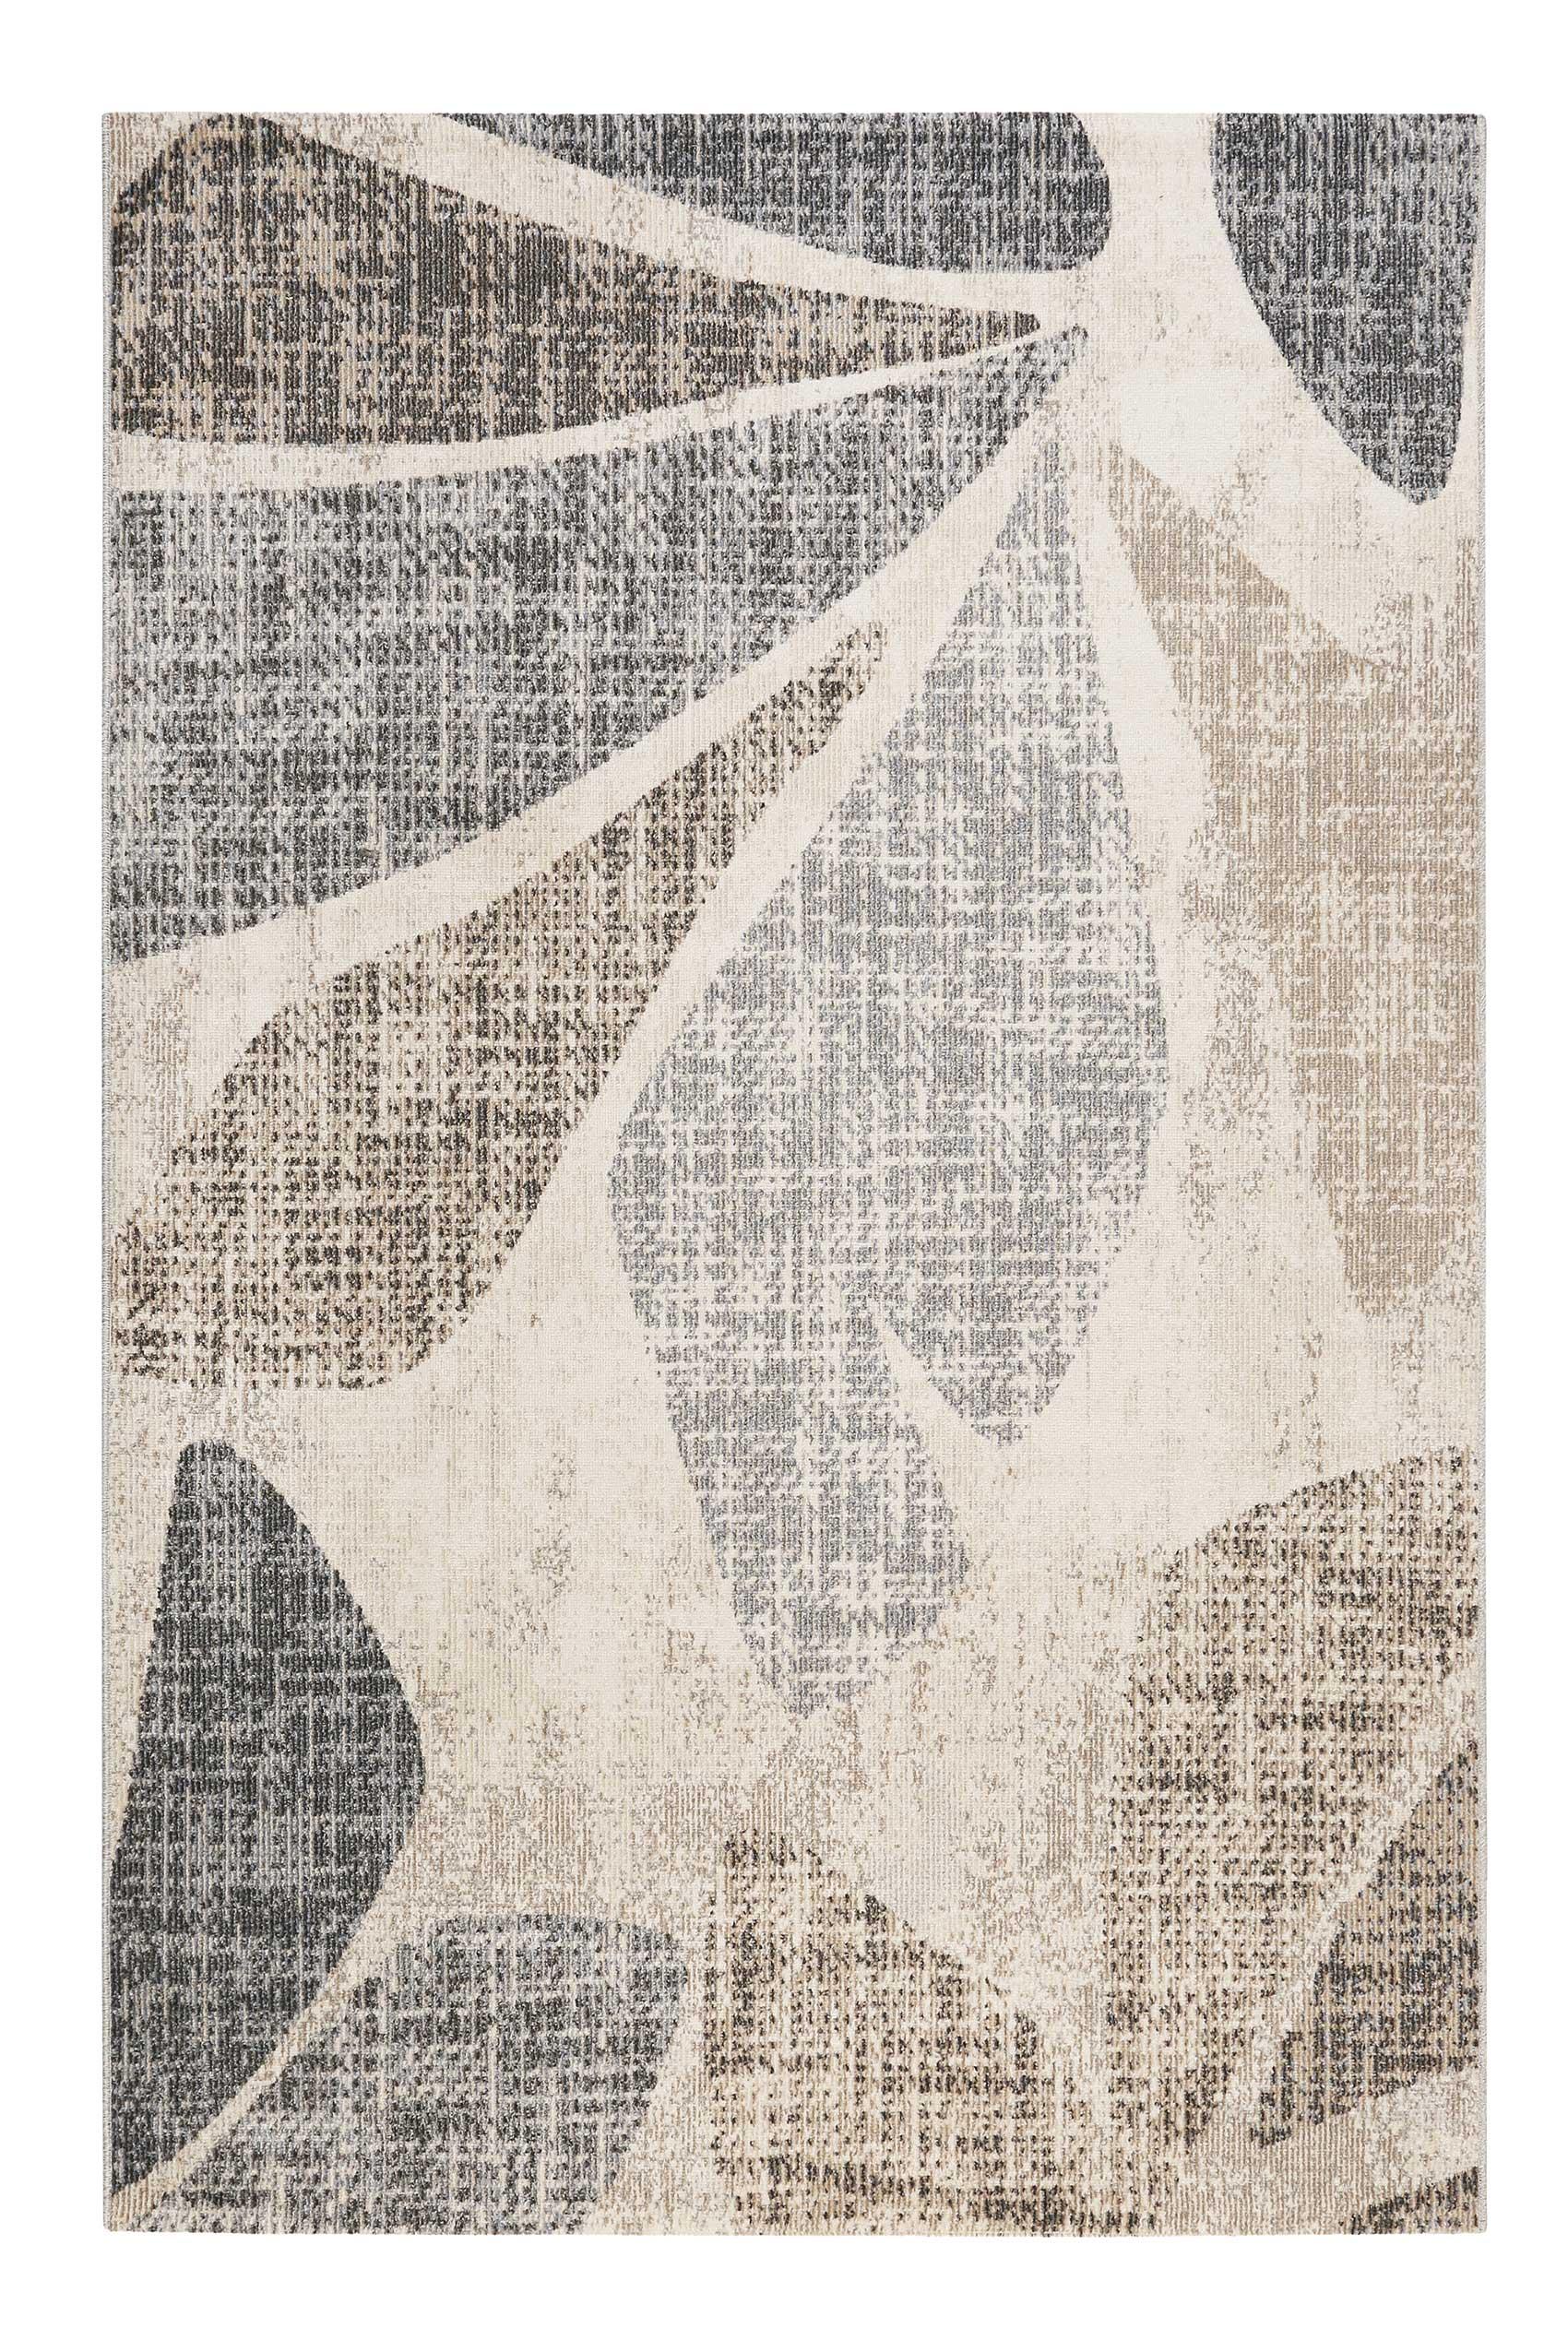 Tapis in/outdoor design inspiration nature gris beige marron 80x150